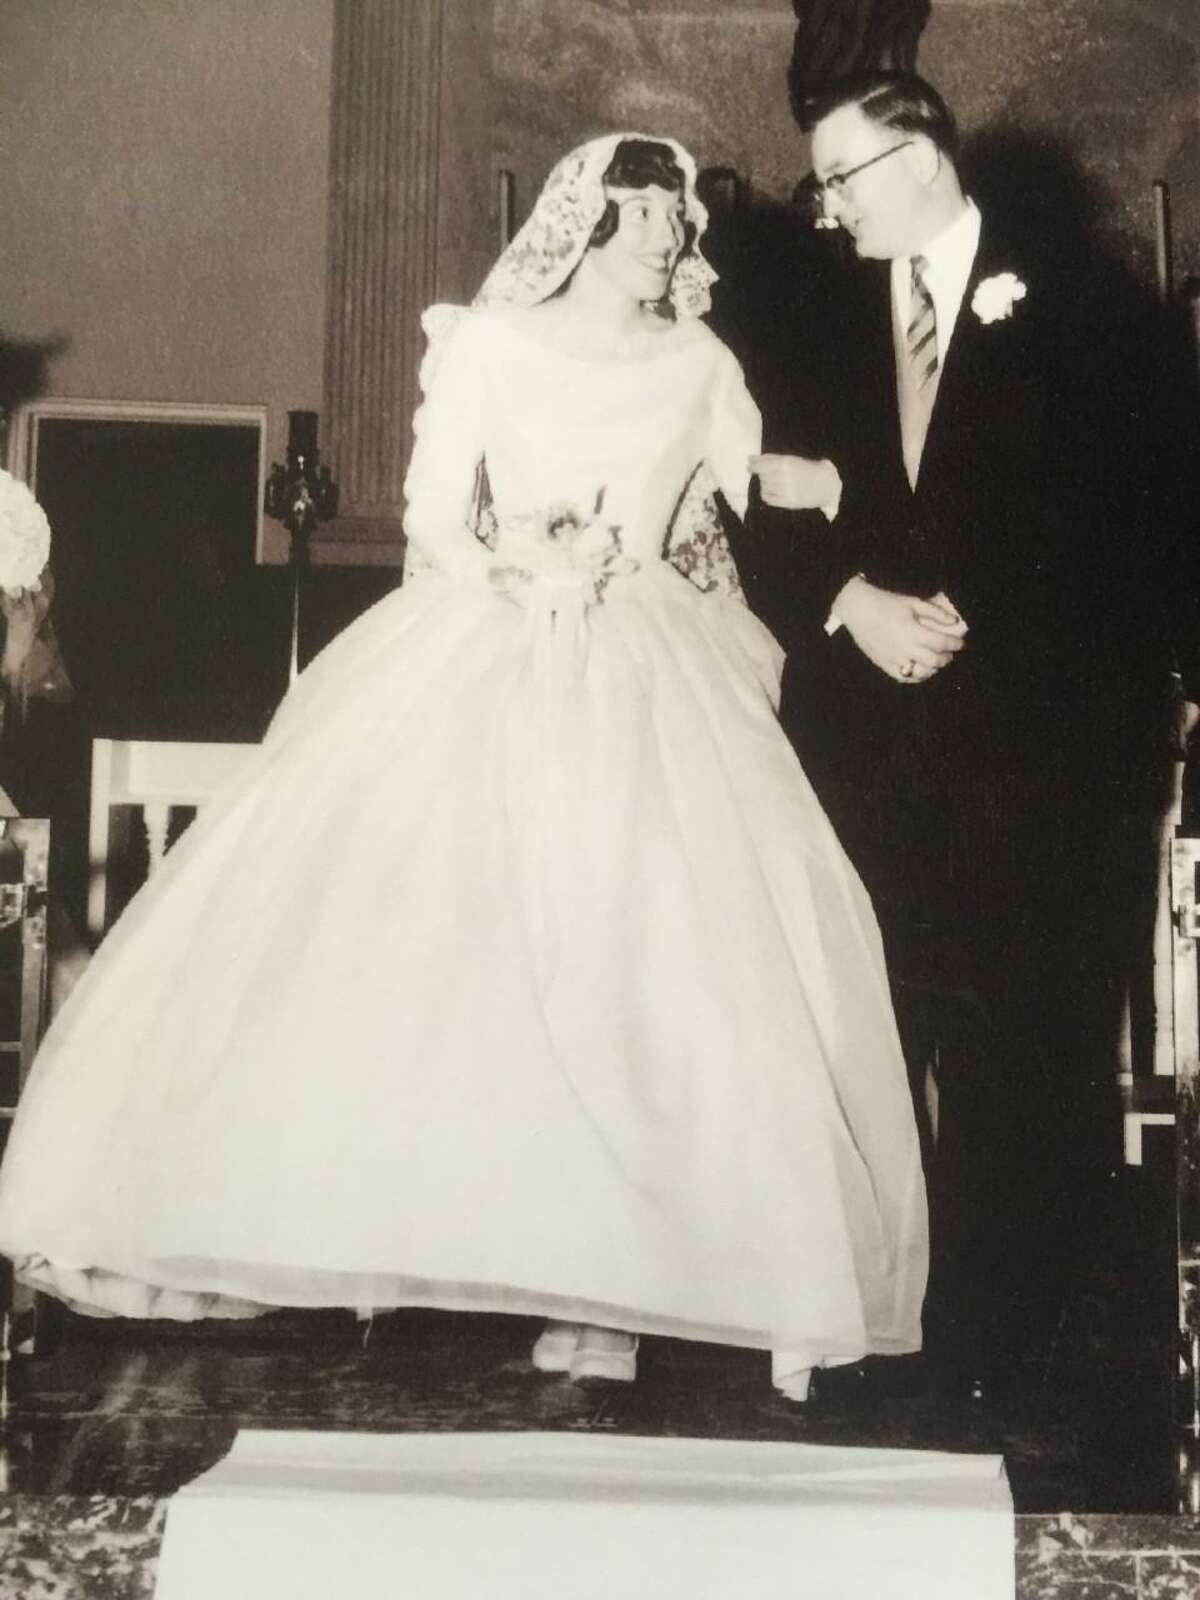 Joe and Anne Surber